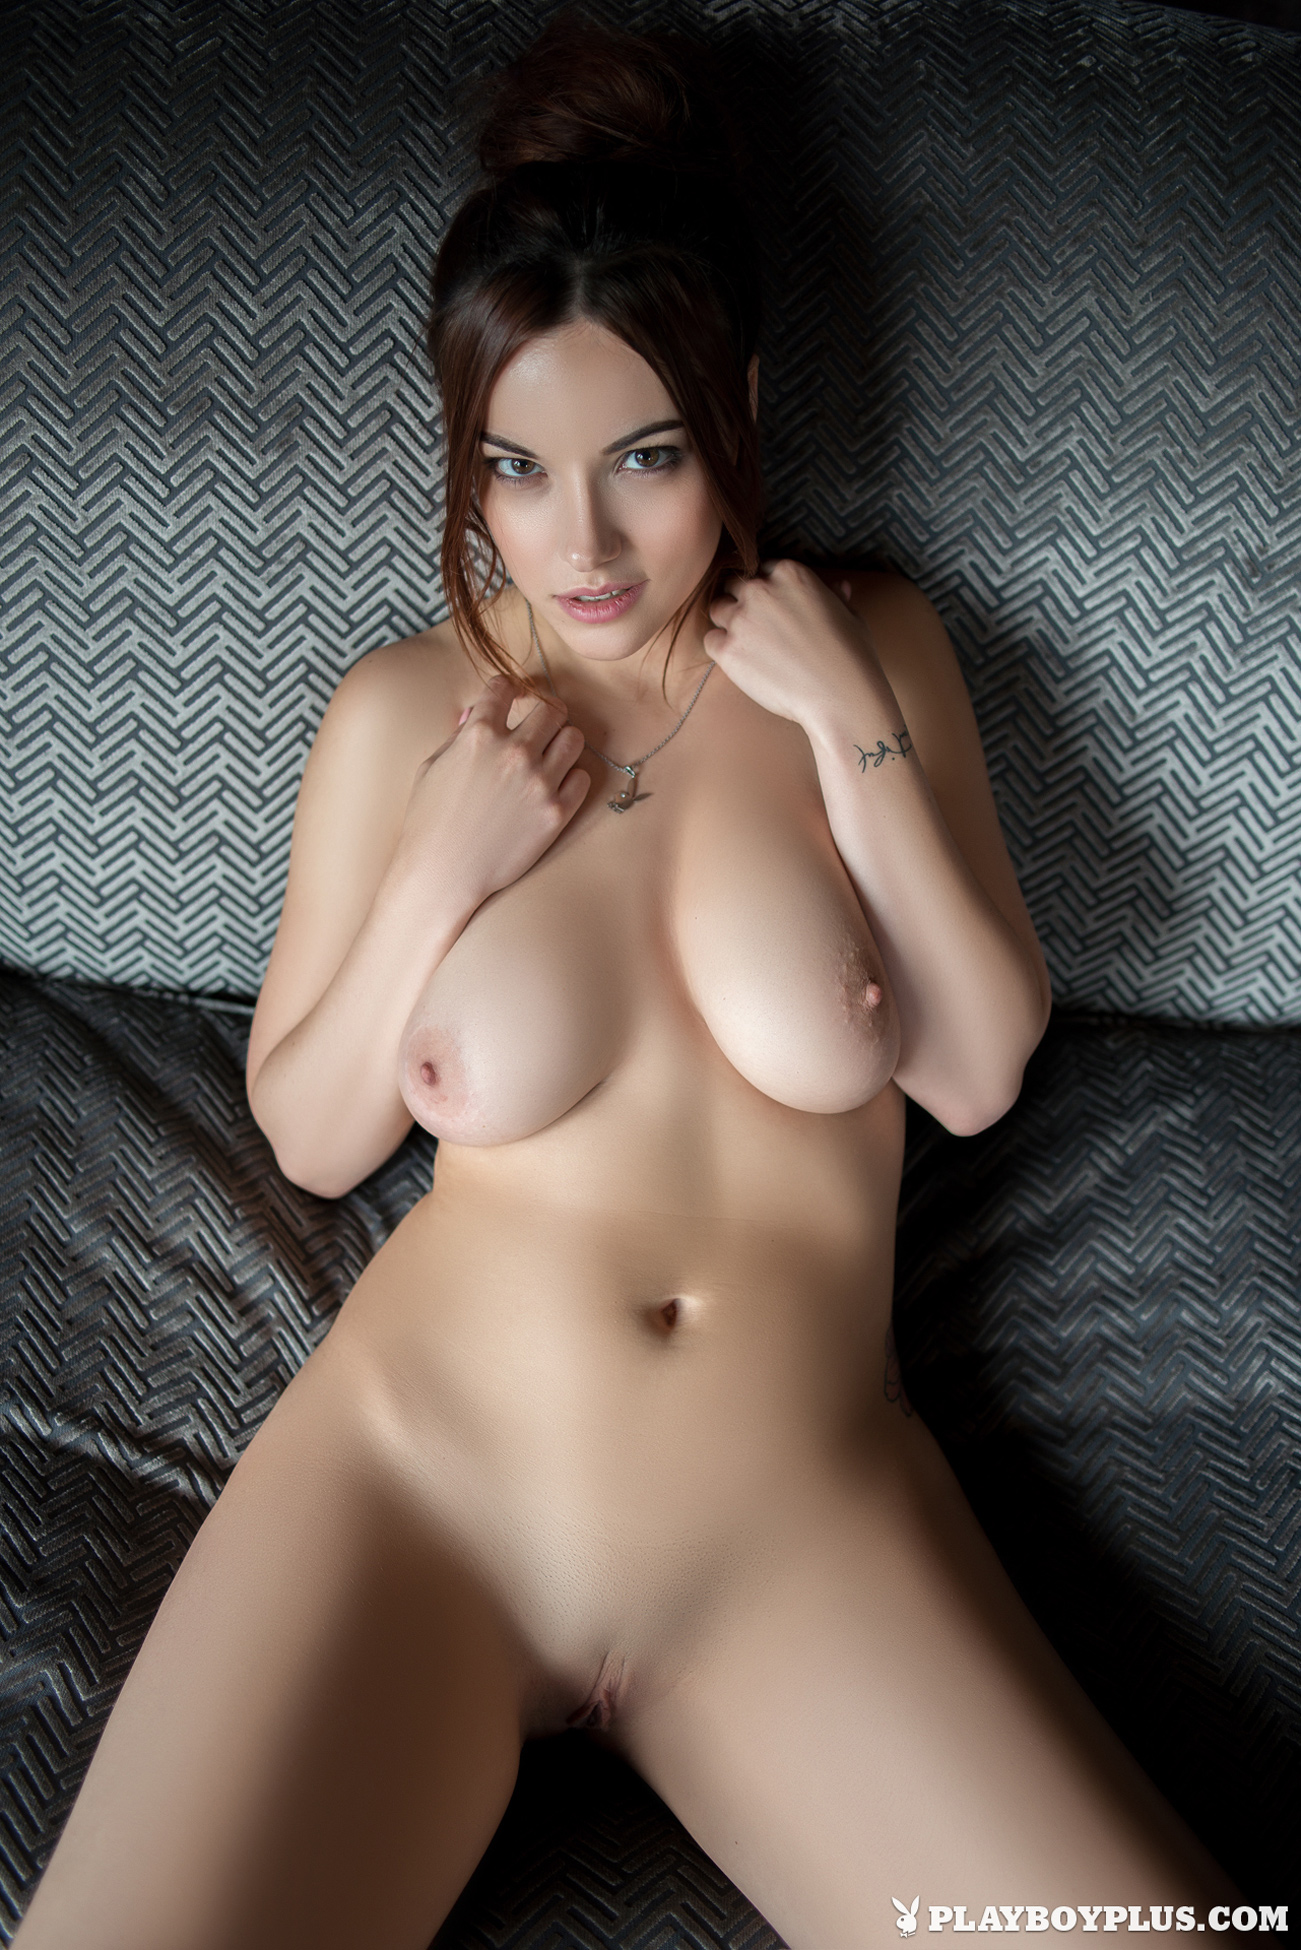 elizabeth-marxs-boobs-sofa-naked-playboy-20